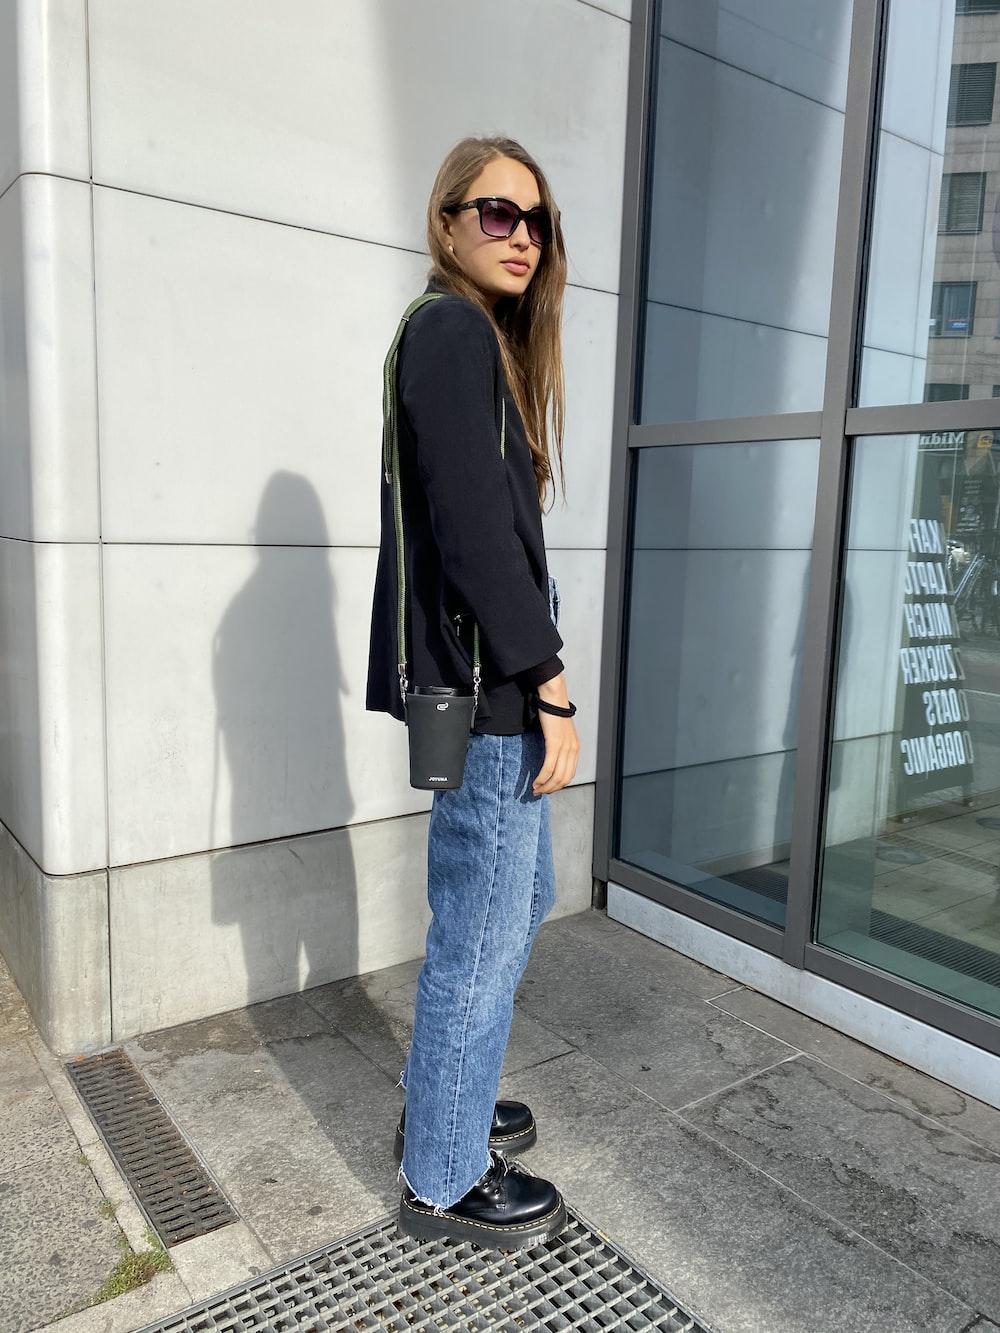 woman in black blazer and blue denim jeans standing near glass window